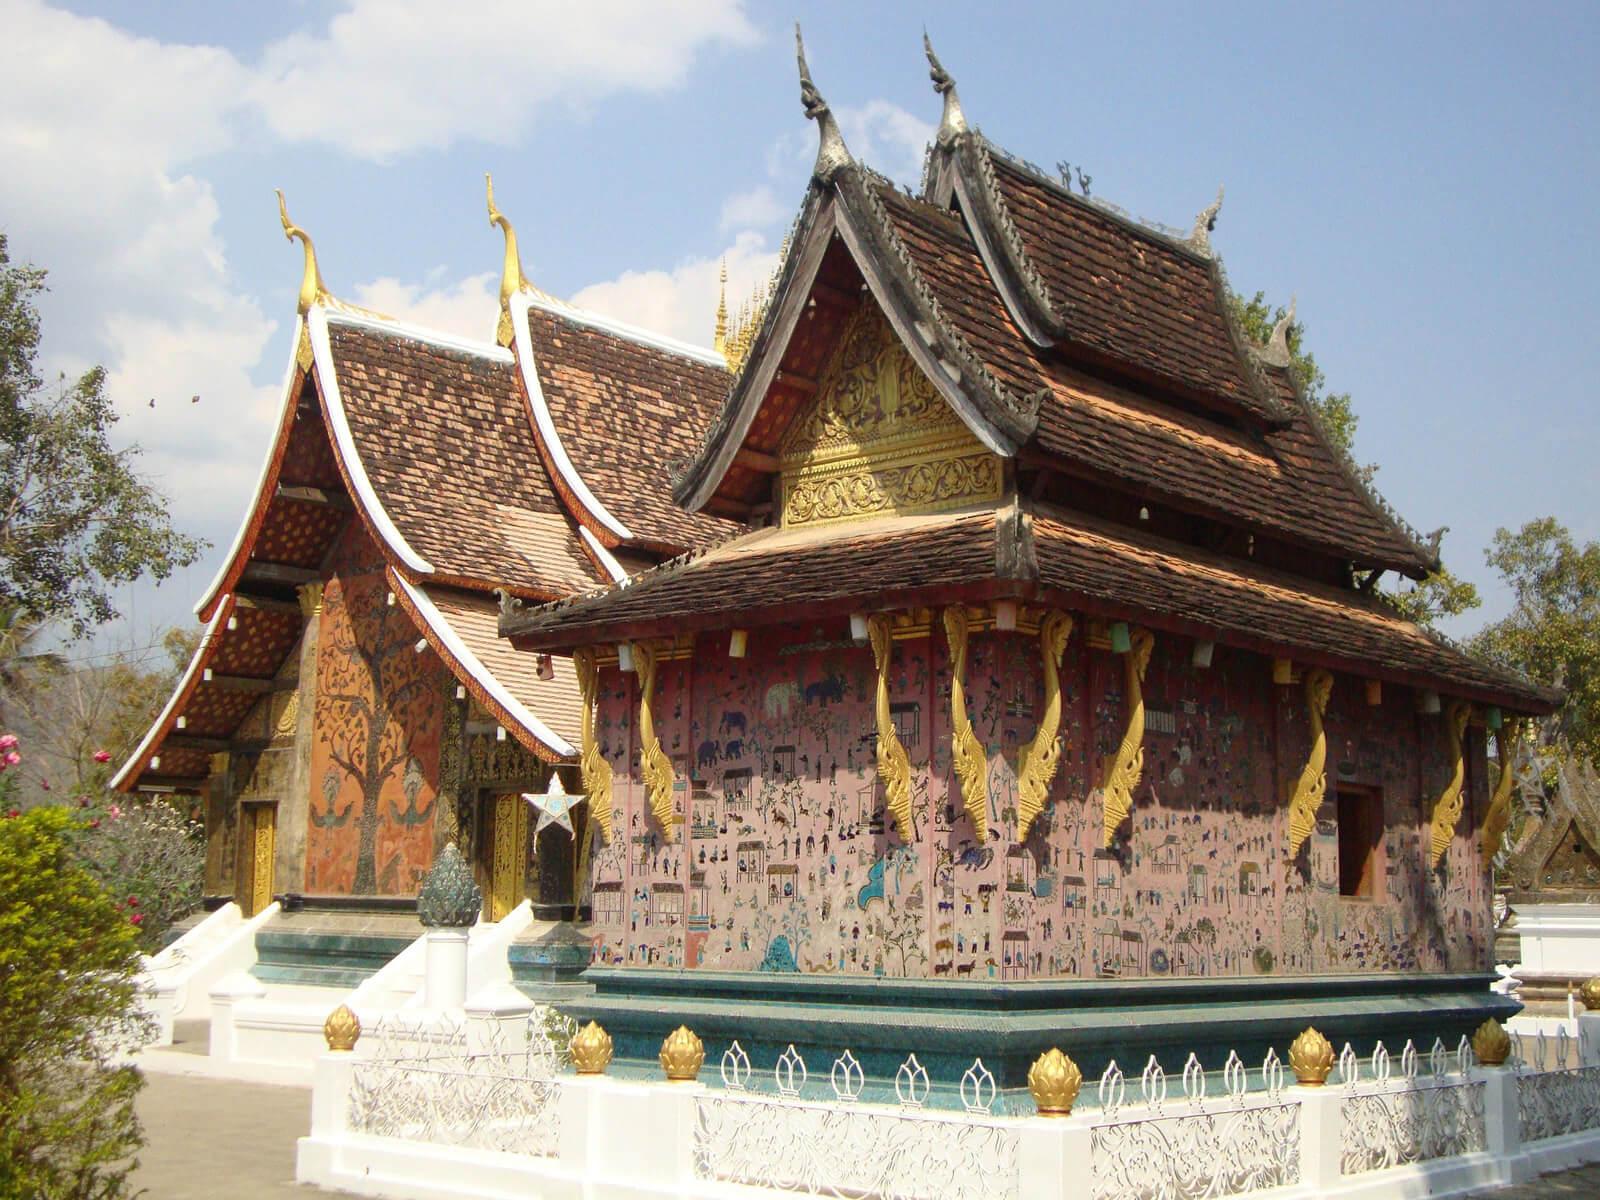 rondreis laos vientiane hoogtepunt 13